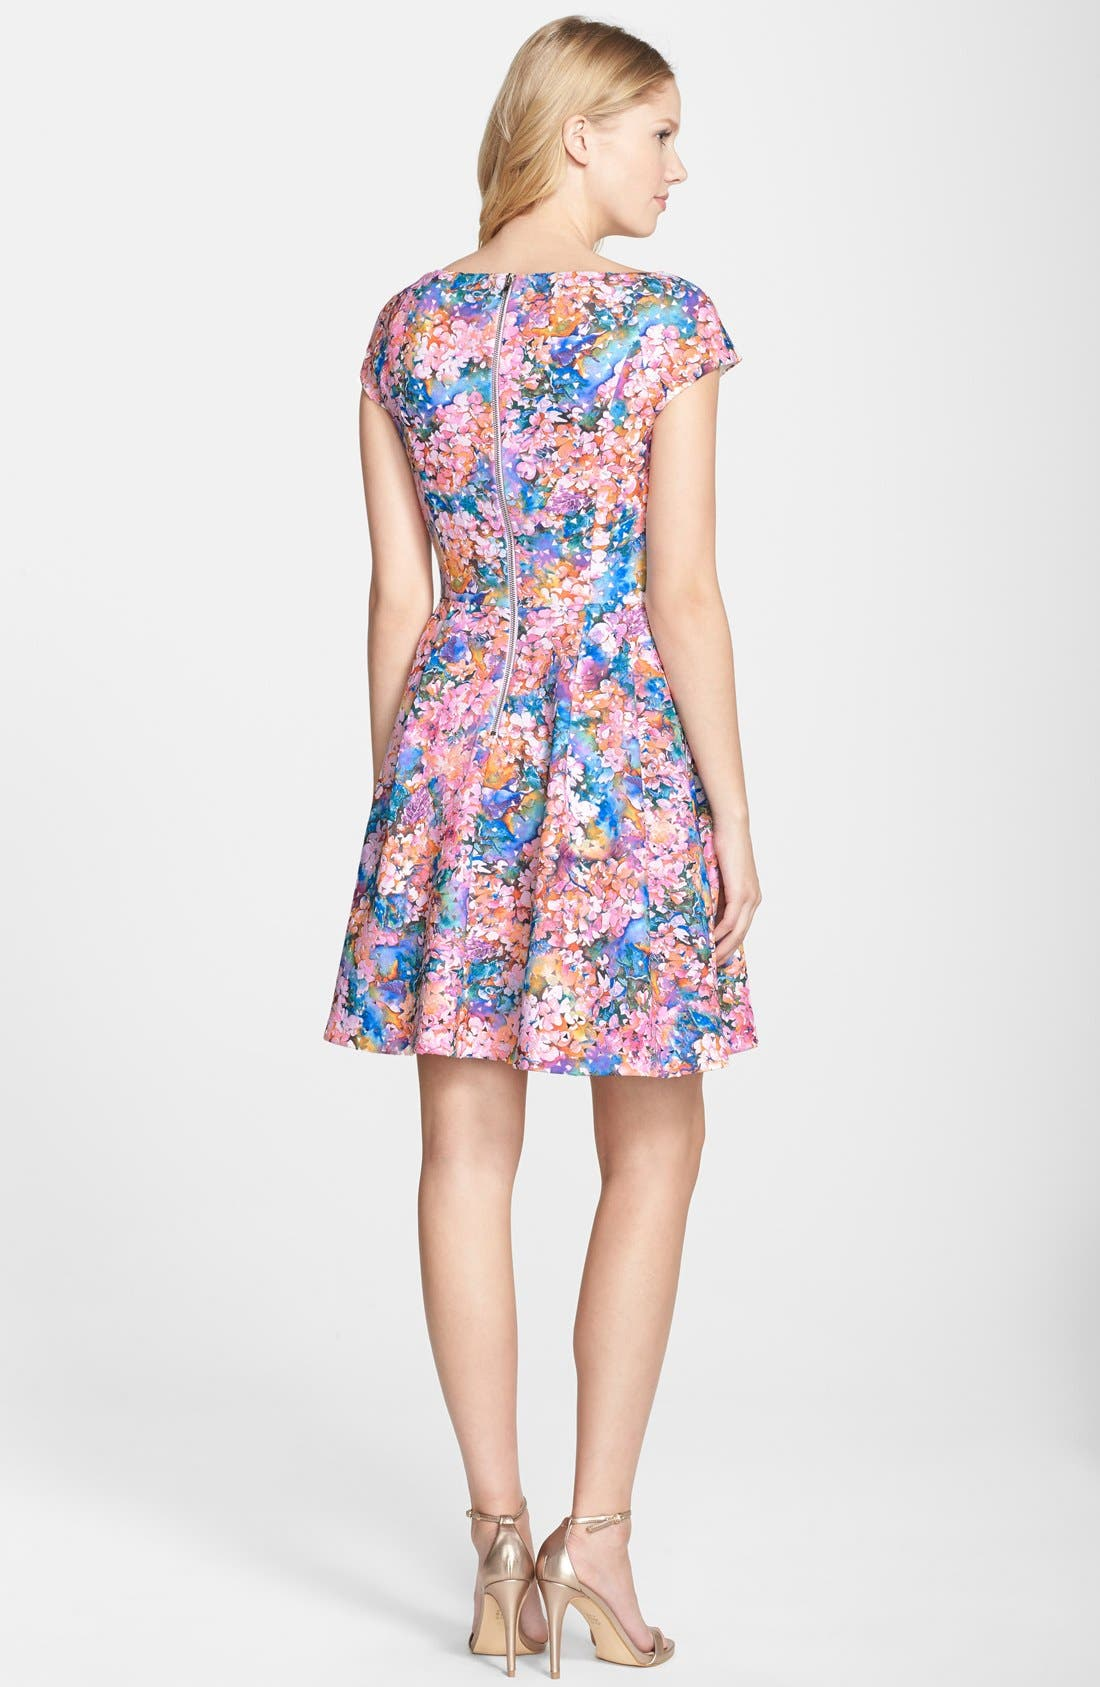 BETSEY JOHNSON,                             Laser Cut Floral Print Scuba Fit & Flare Dress,                             Alternate thumbnail 4, color,                             650